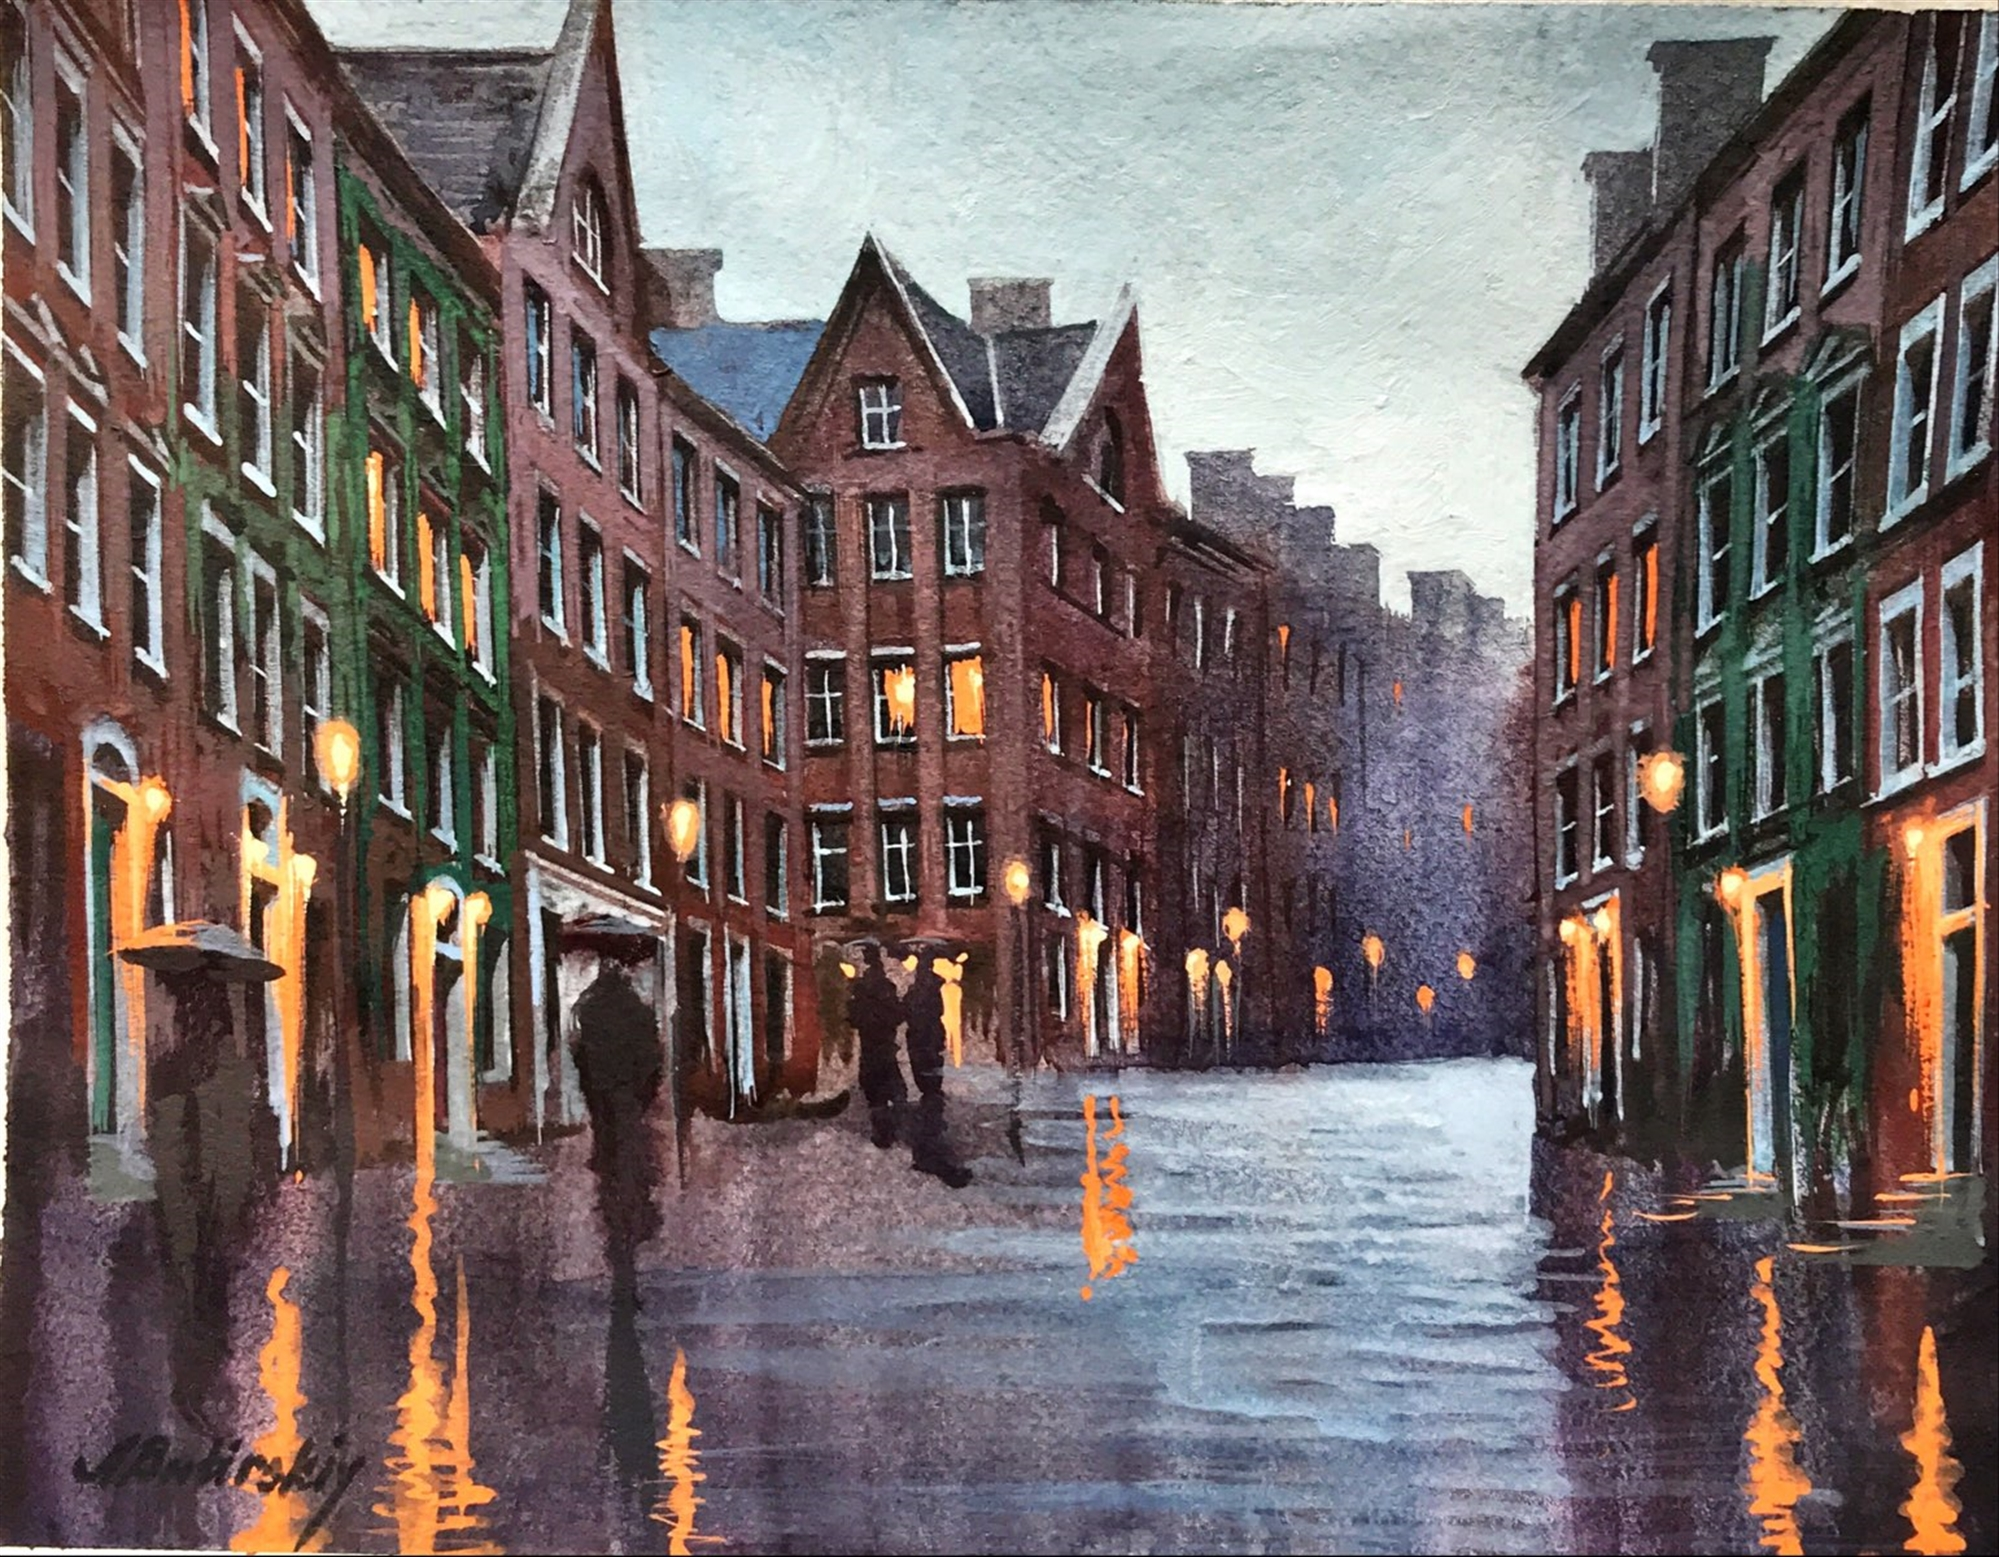 Dublin at Dusk by Alexei Butirskiy